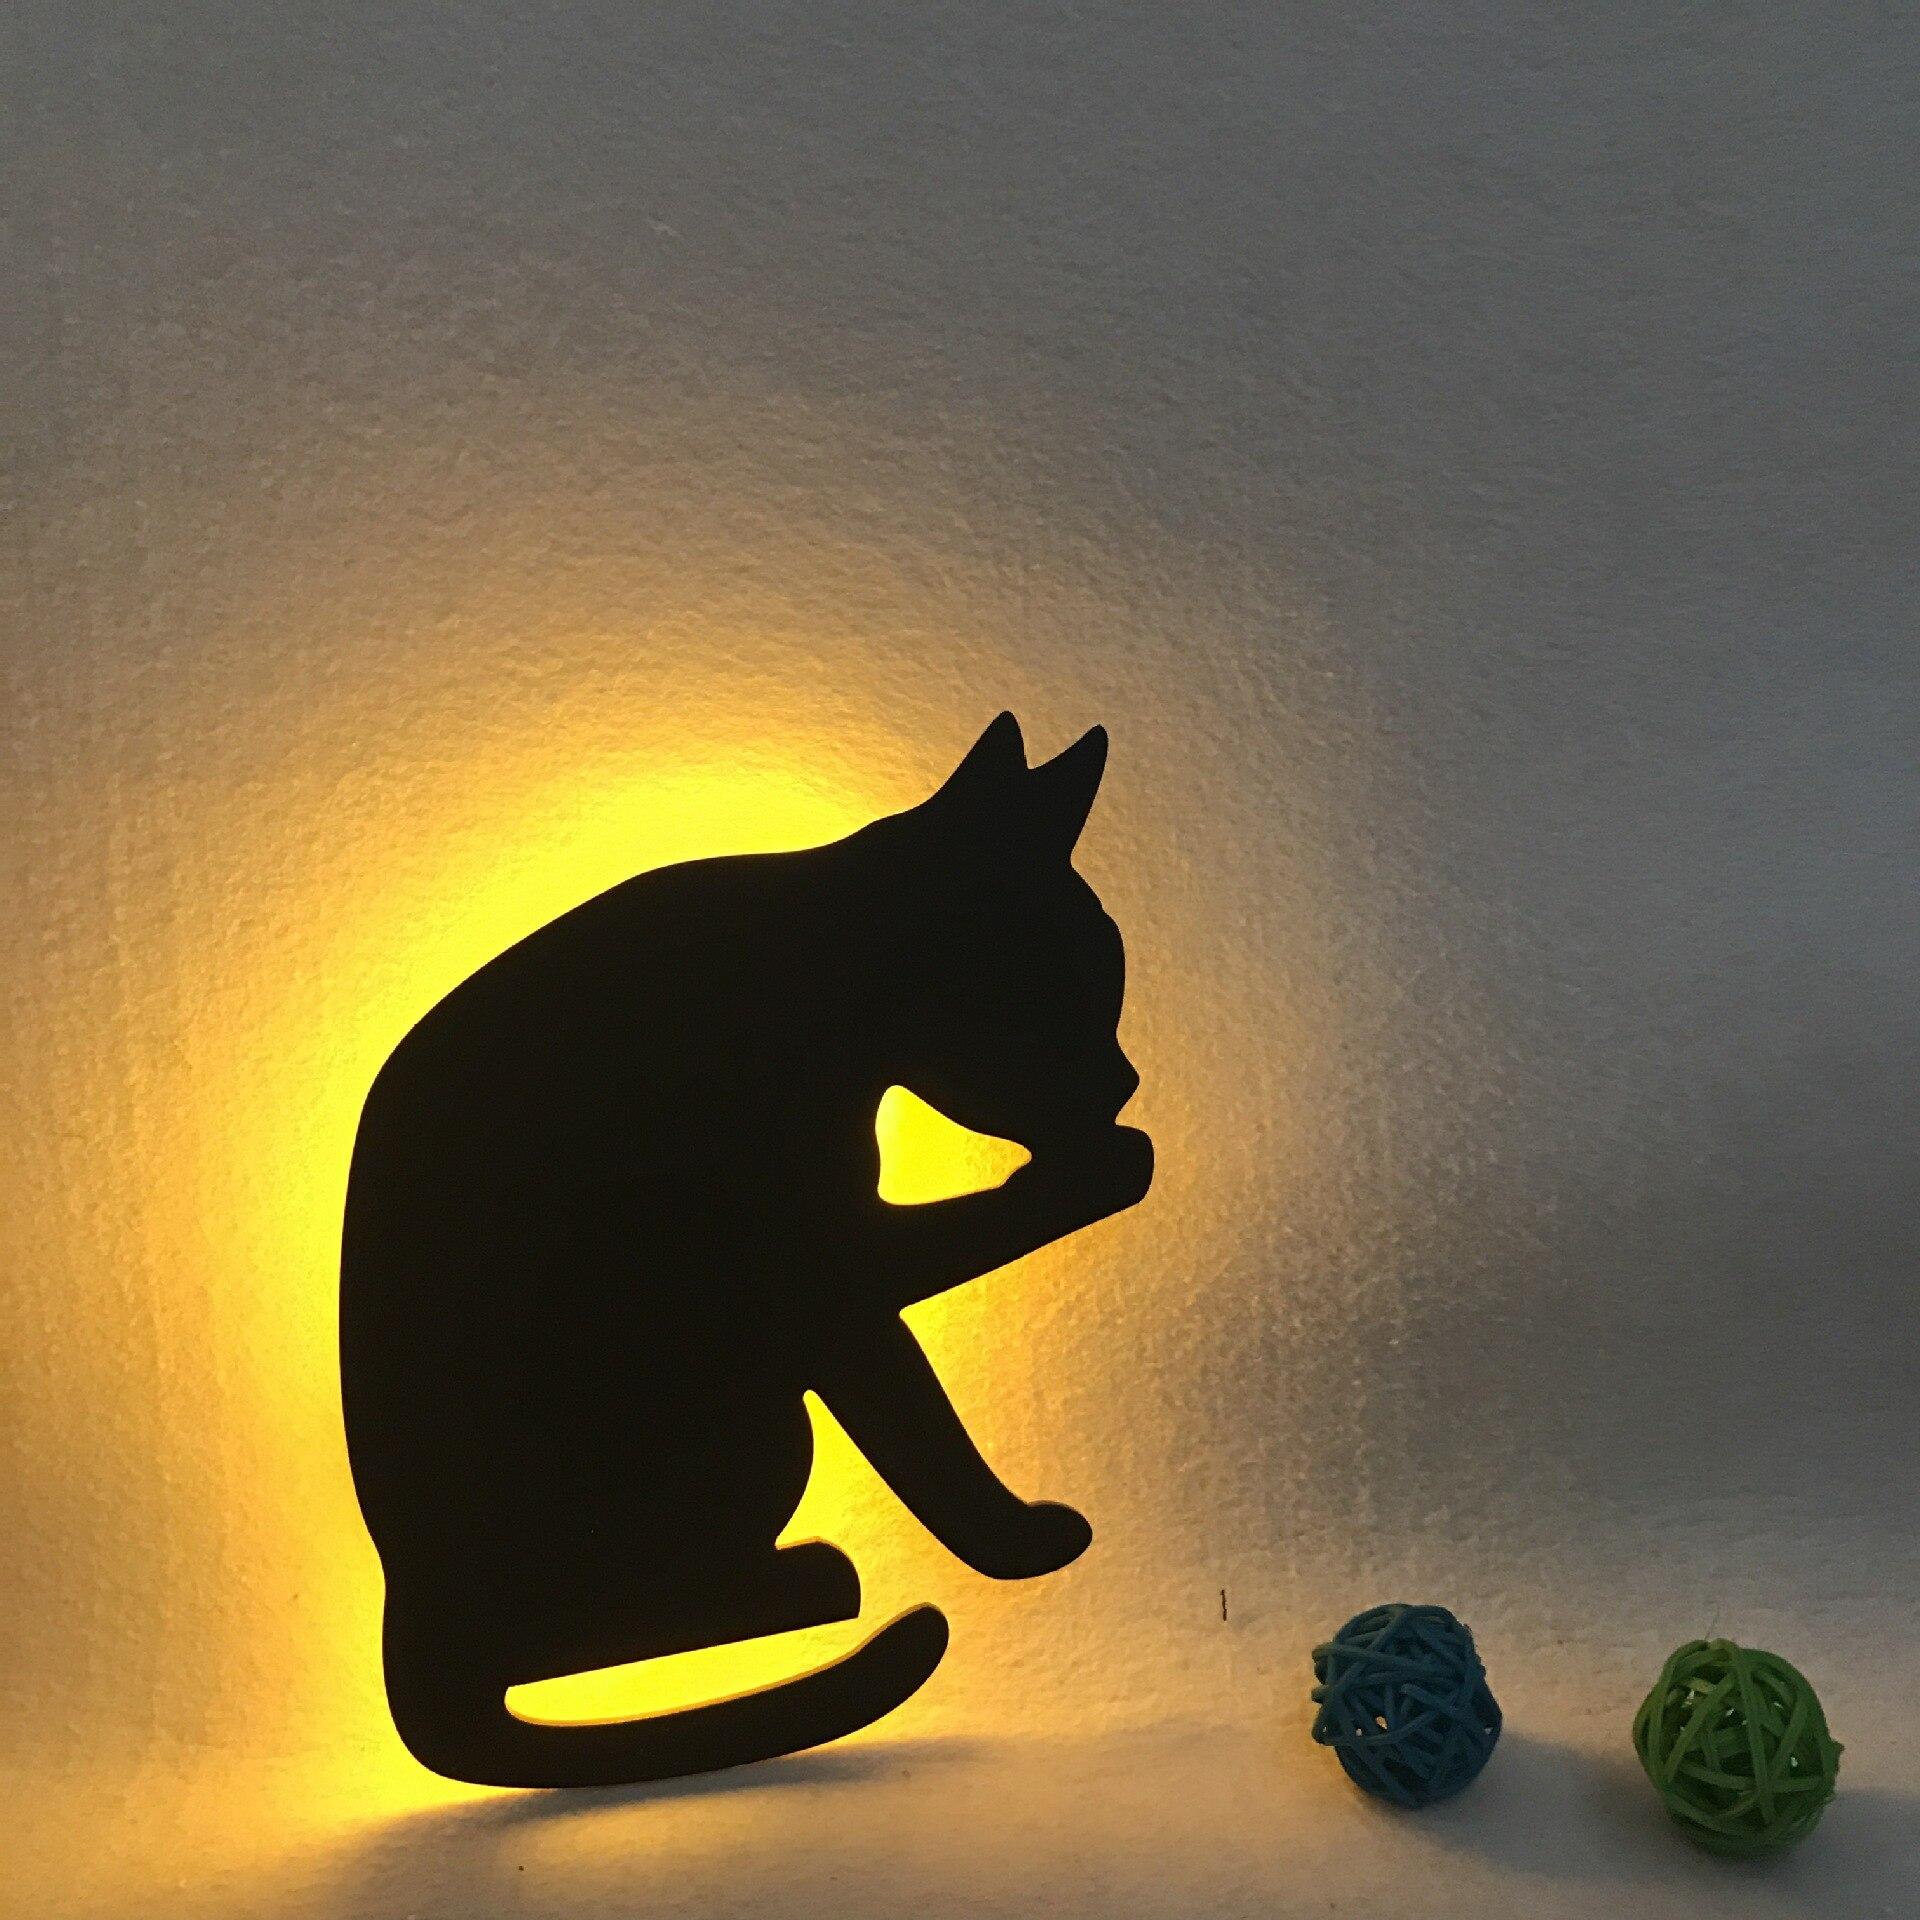 Cat Night Light Lamp Led Battery Operated Voice Sensor For